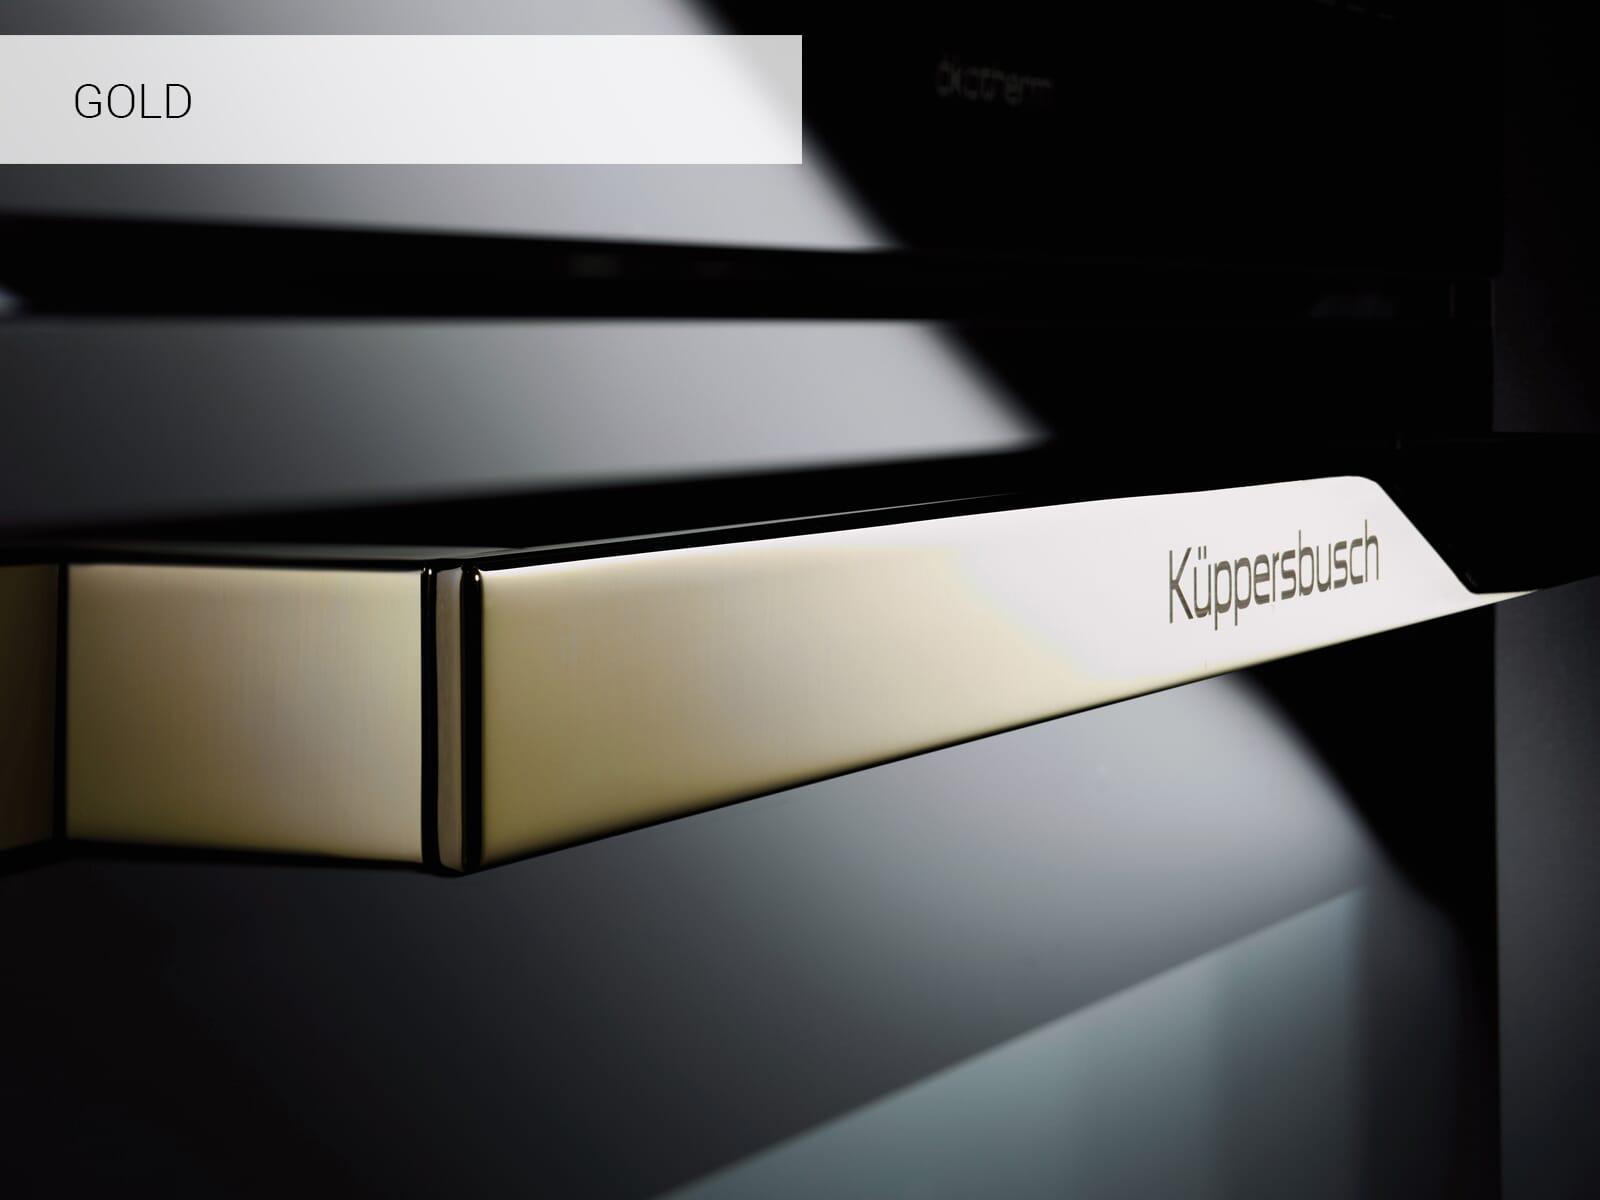 Küppersbusch B 6335.0 S4 Comfort+ Backofen Schwarz/Gold